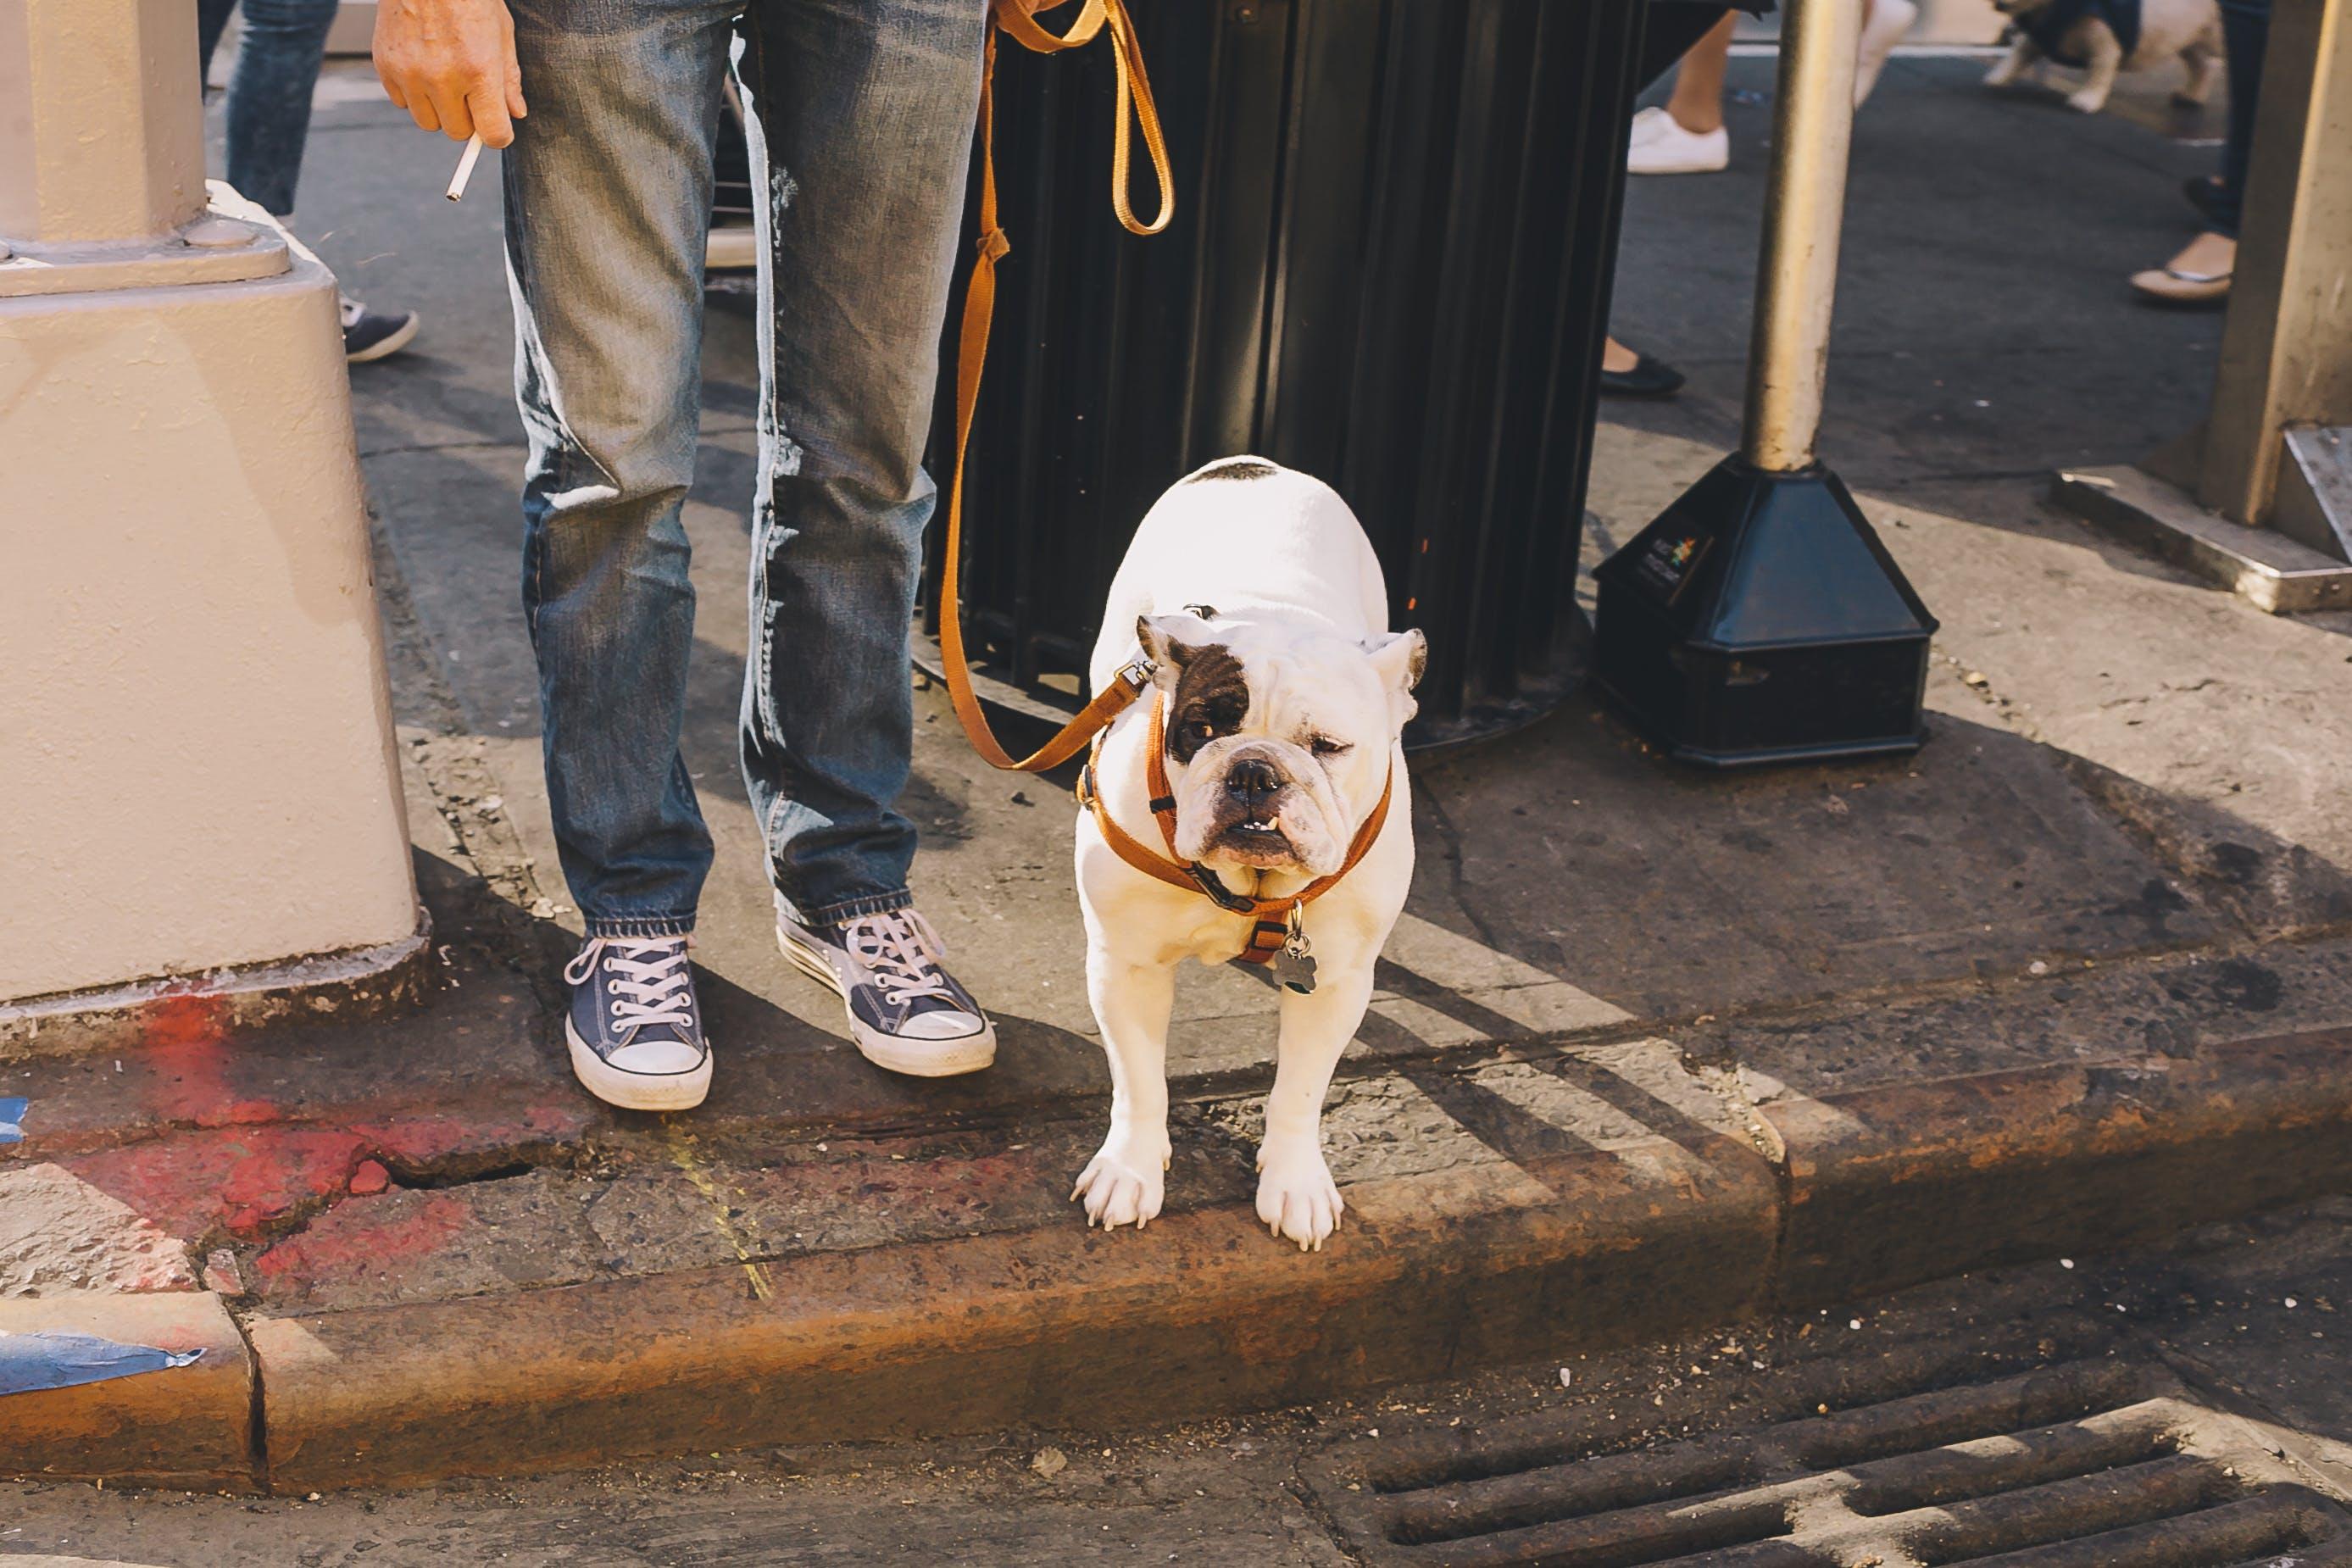 White and Black Molosser Dog on Leash